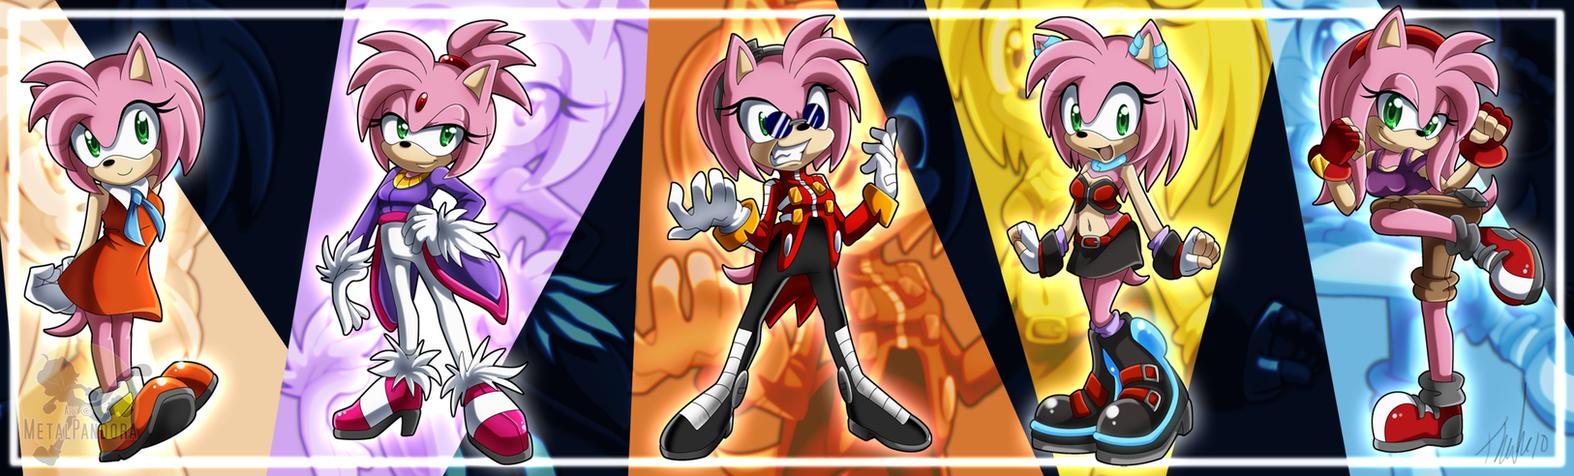 30OC Sonic Cosplays By MetalPandora